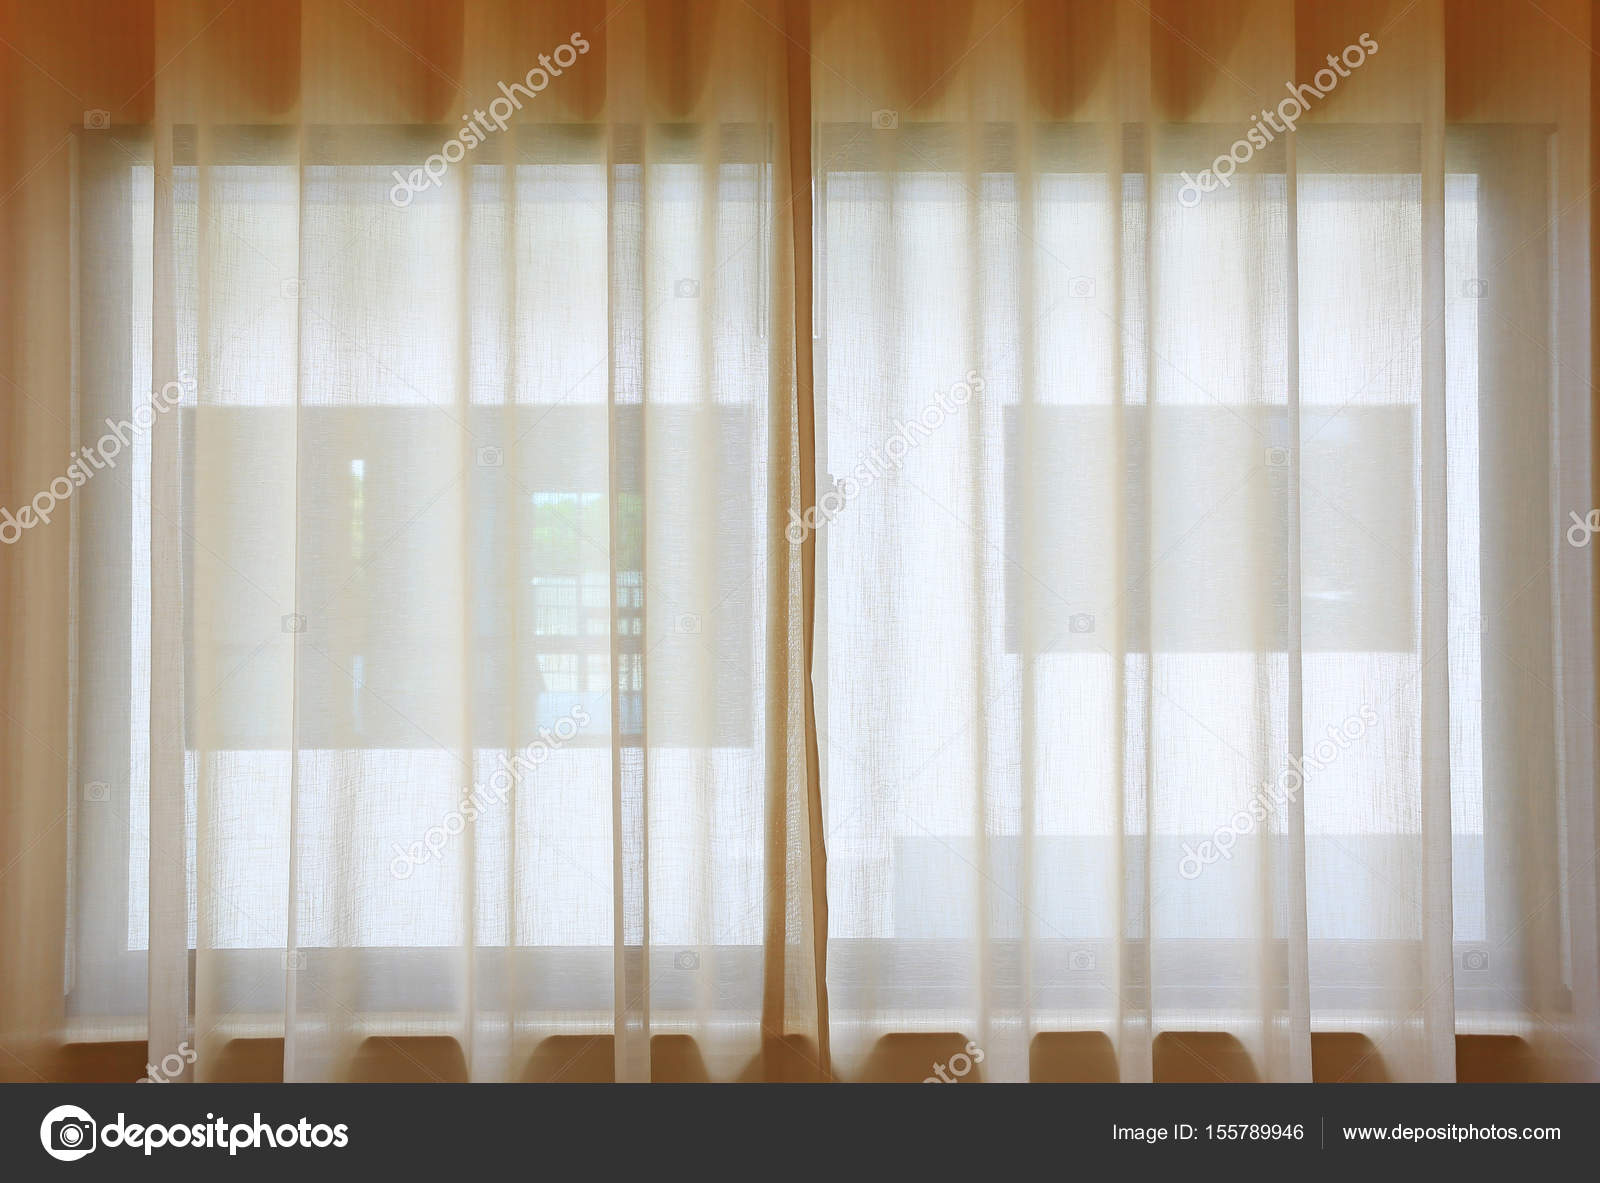 https://st3.depositphotos.com/12318692/15578/i/1600/depositphotos_155789946-stockafbeelding-transparante-gordijn-op-venster-gordijn.jpg